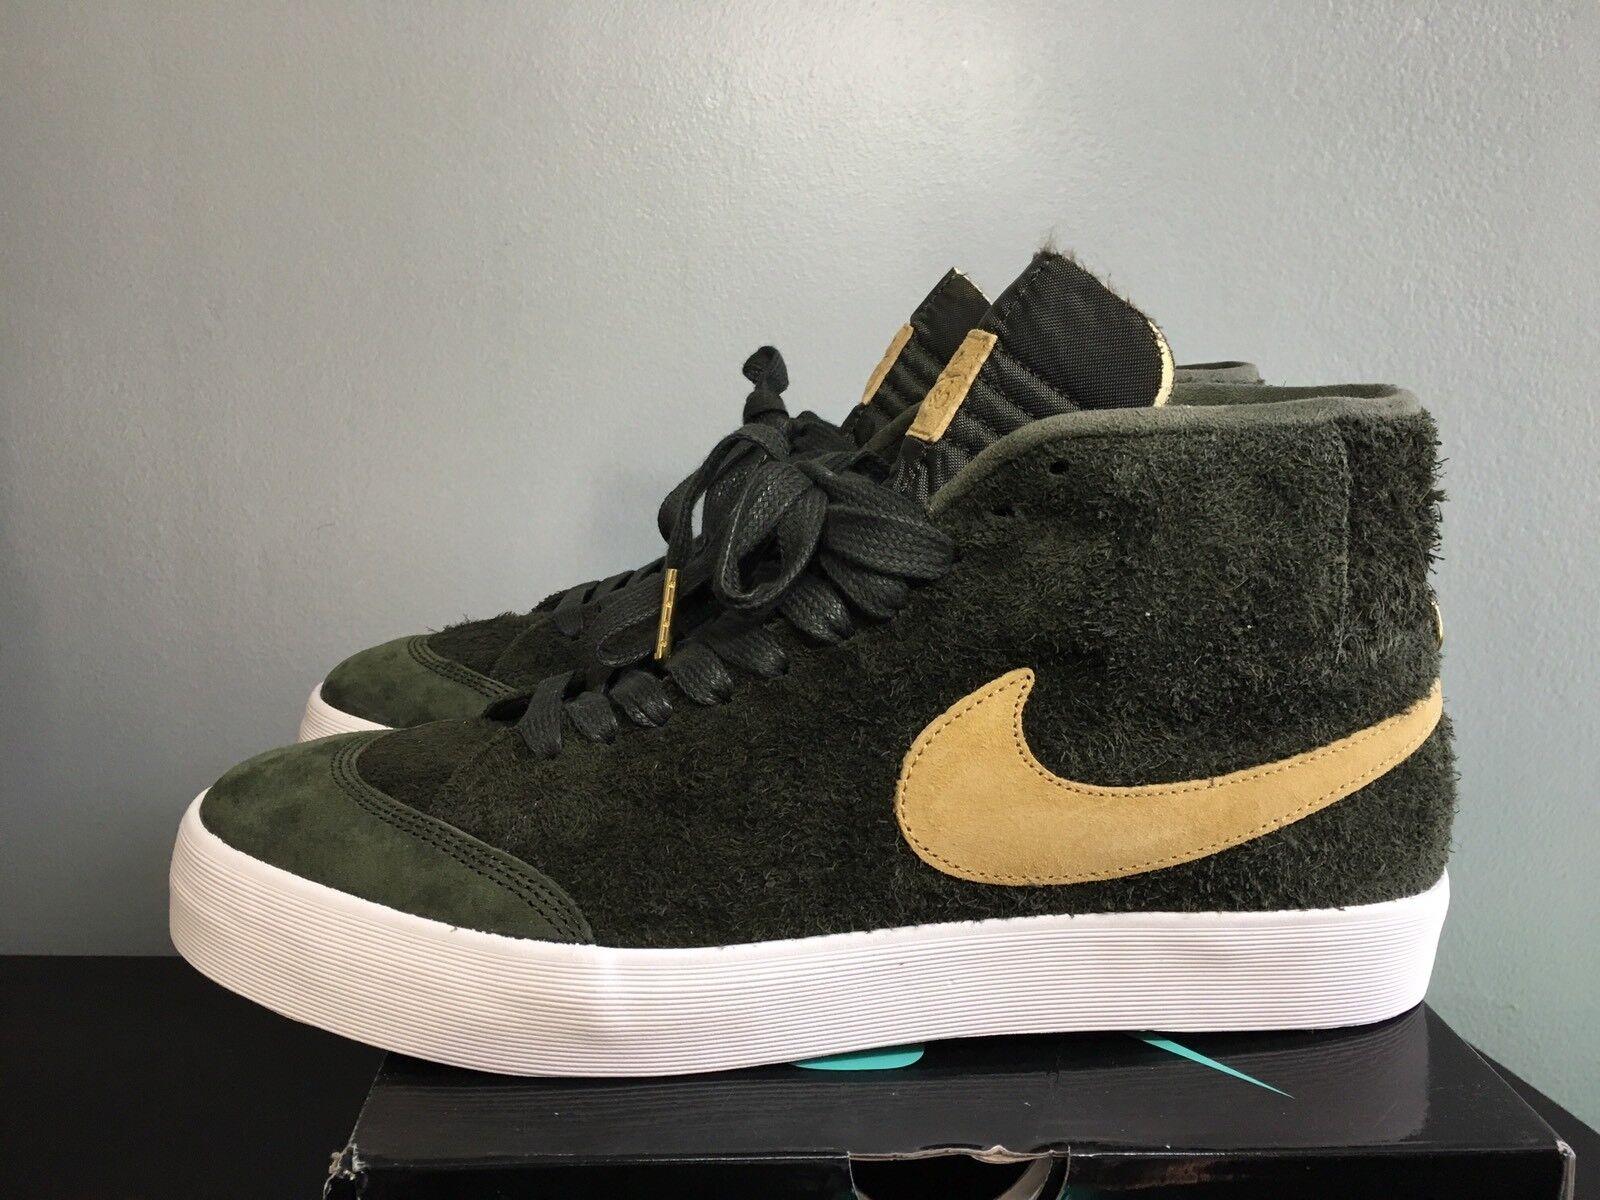 Nike SB Zoom Blazer Mid QS Project 58 Sequoia gold AH6158-369 Size 10